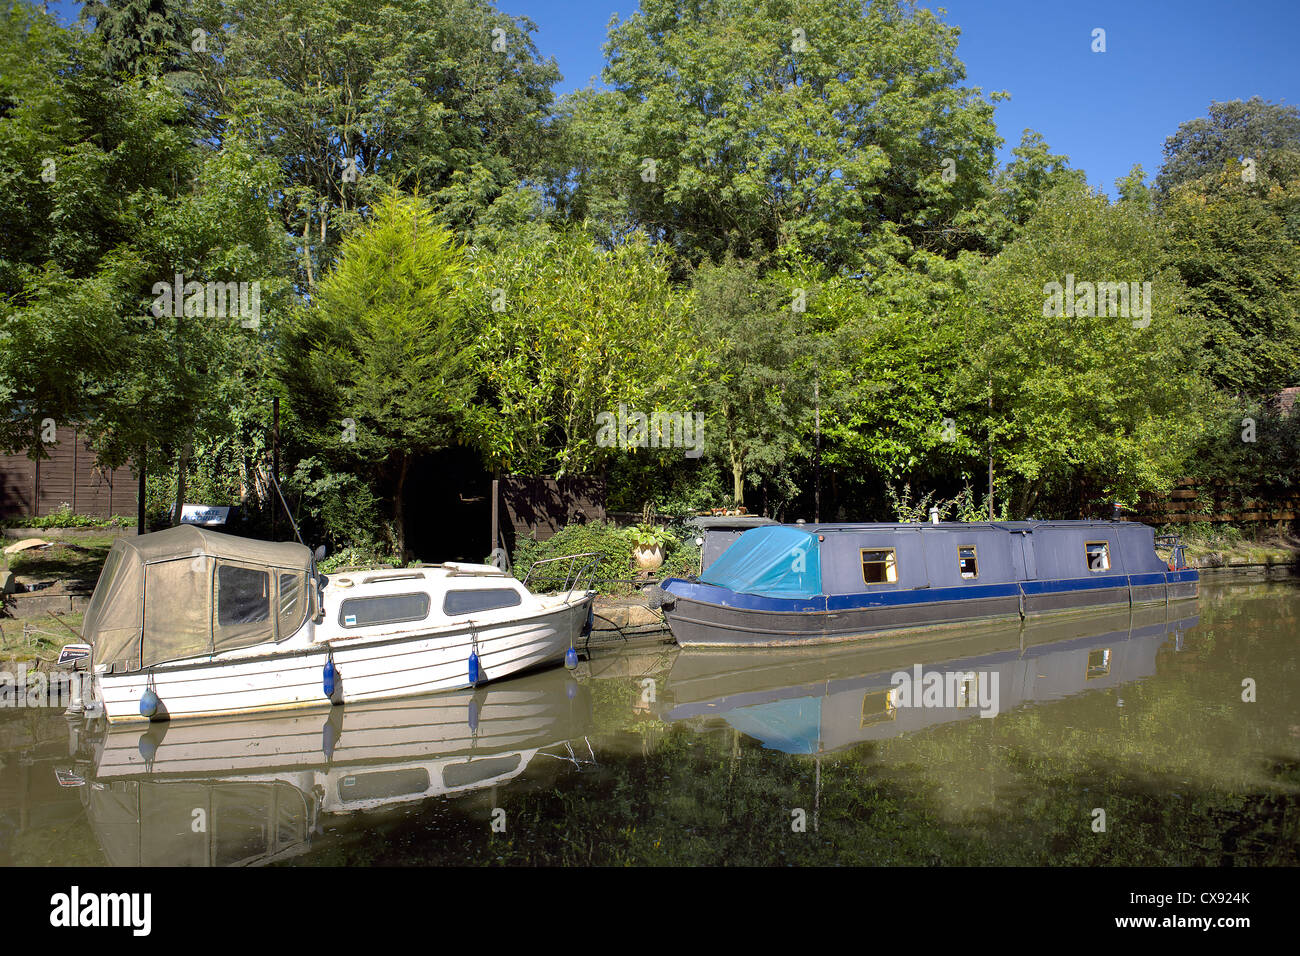 Boats on the Grand Union Canal, Warwickshire, England, UK, narrow, boat, cruiser, boats, boating, narrowboat, narrowboats, - Stock Image